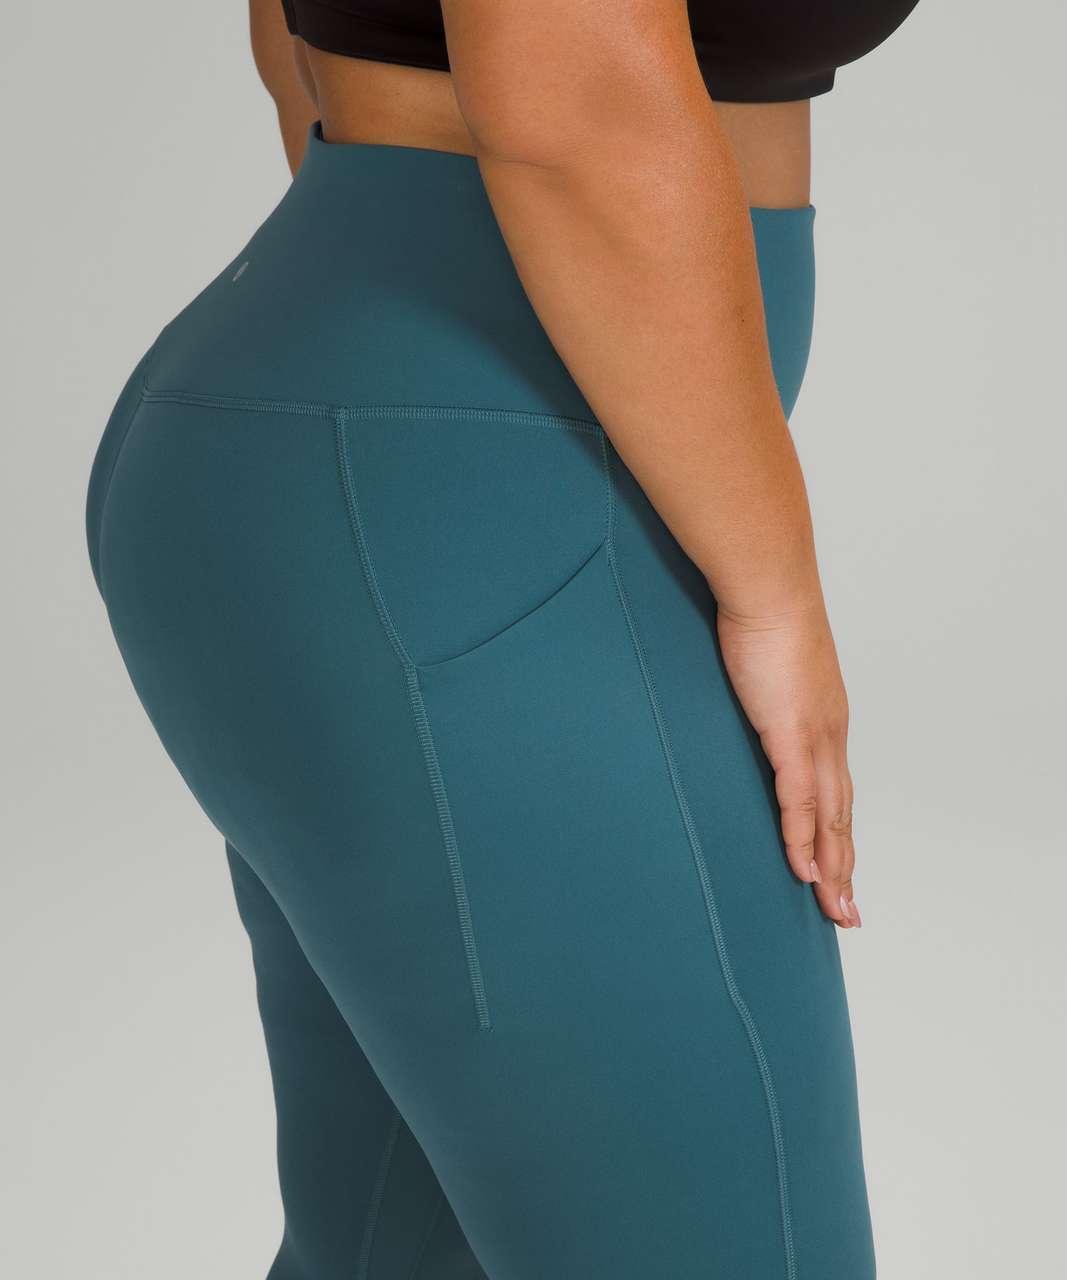 "Lululemon Align High-Rise Pant with Pockets 25"" - Capture Blue"